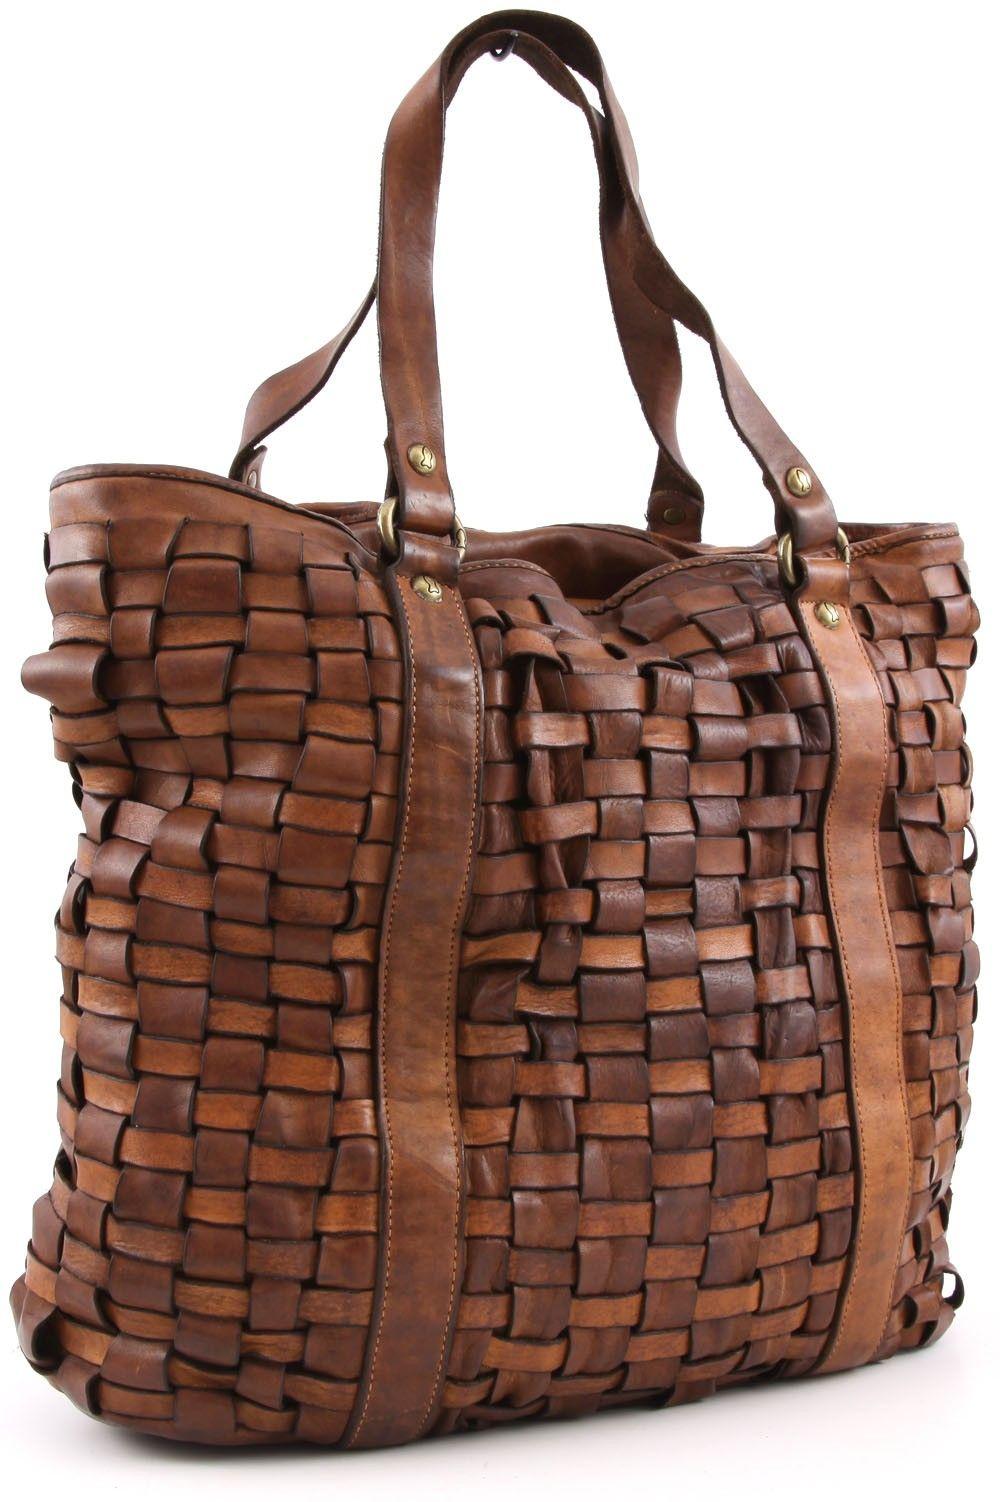 e8198f824679 Campomaggi Intrecciata Tote Leather cognac 42 cm - C1266VL-1702 - Designer  Bags Shop - wardow.com